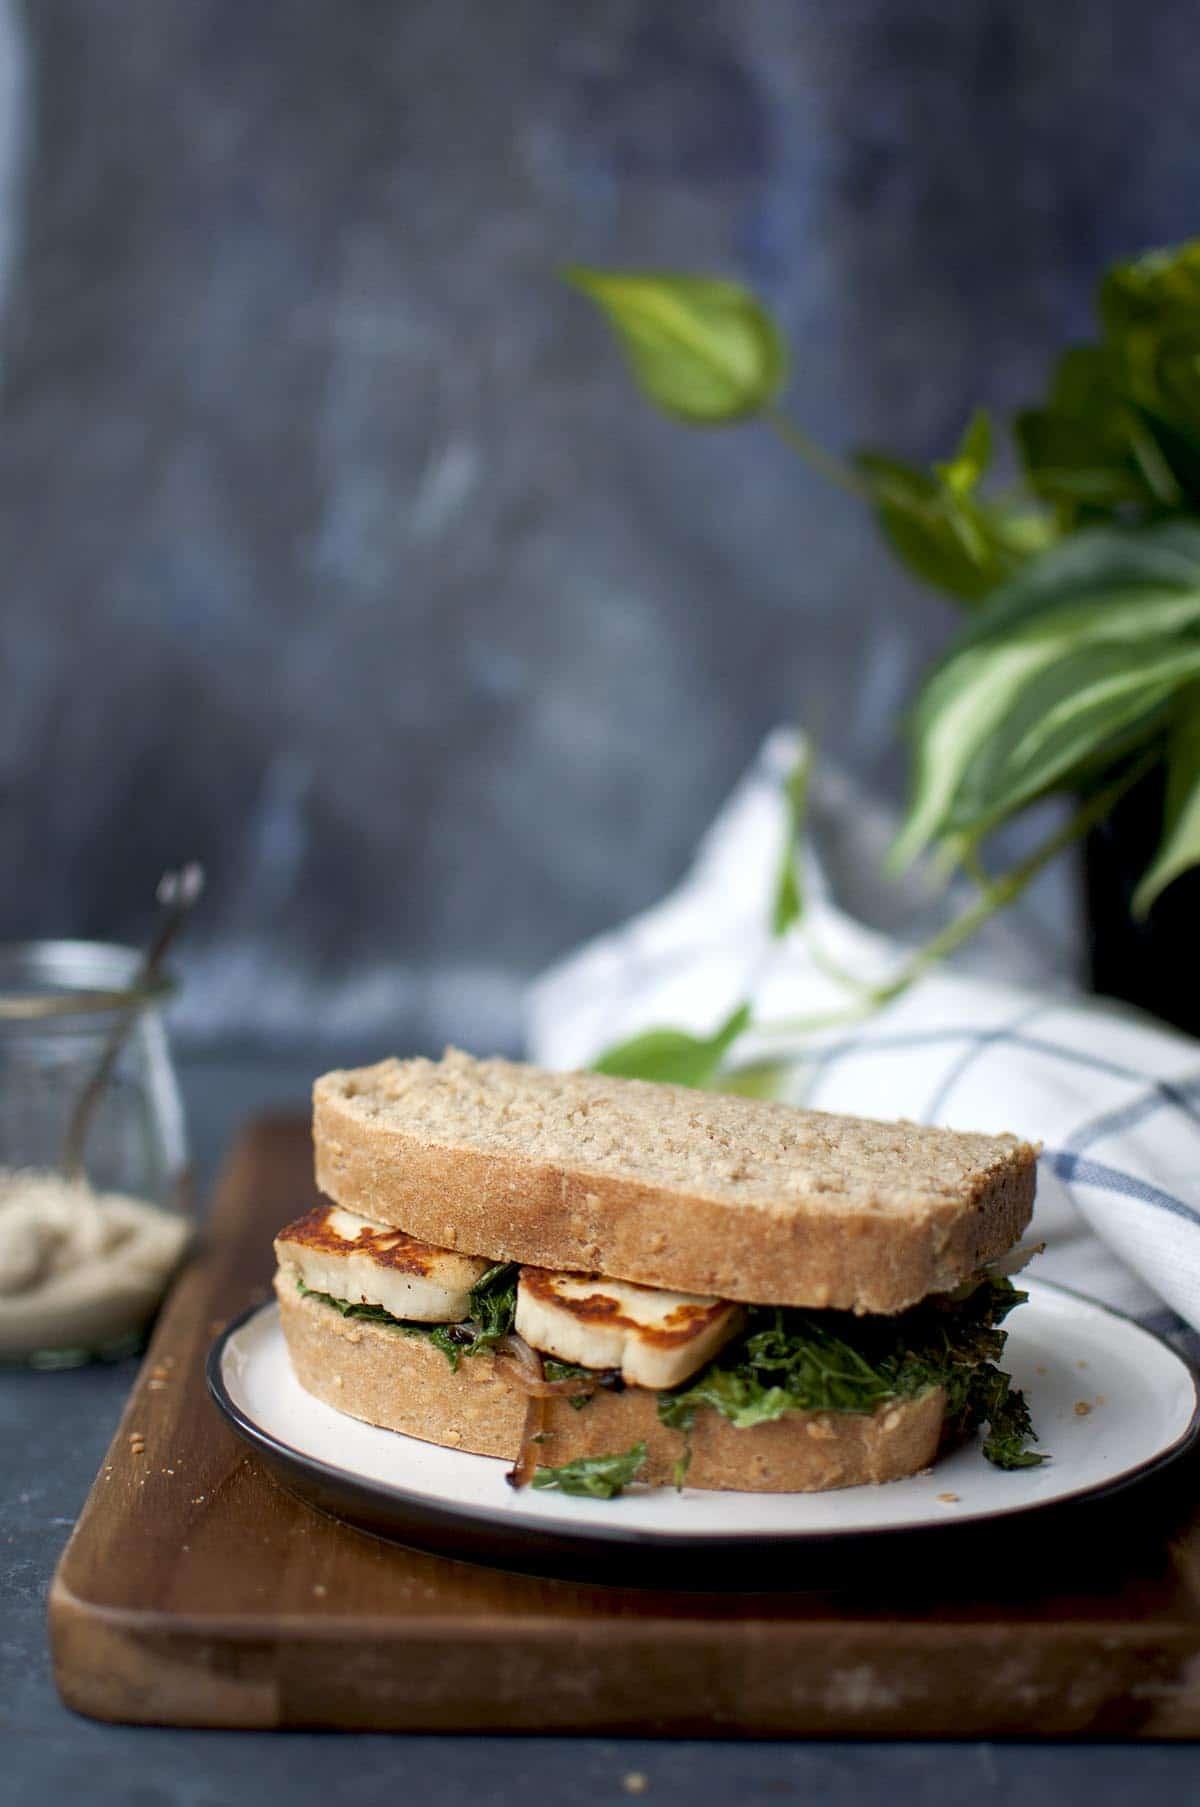 White plate with halloumi sandwich